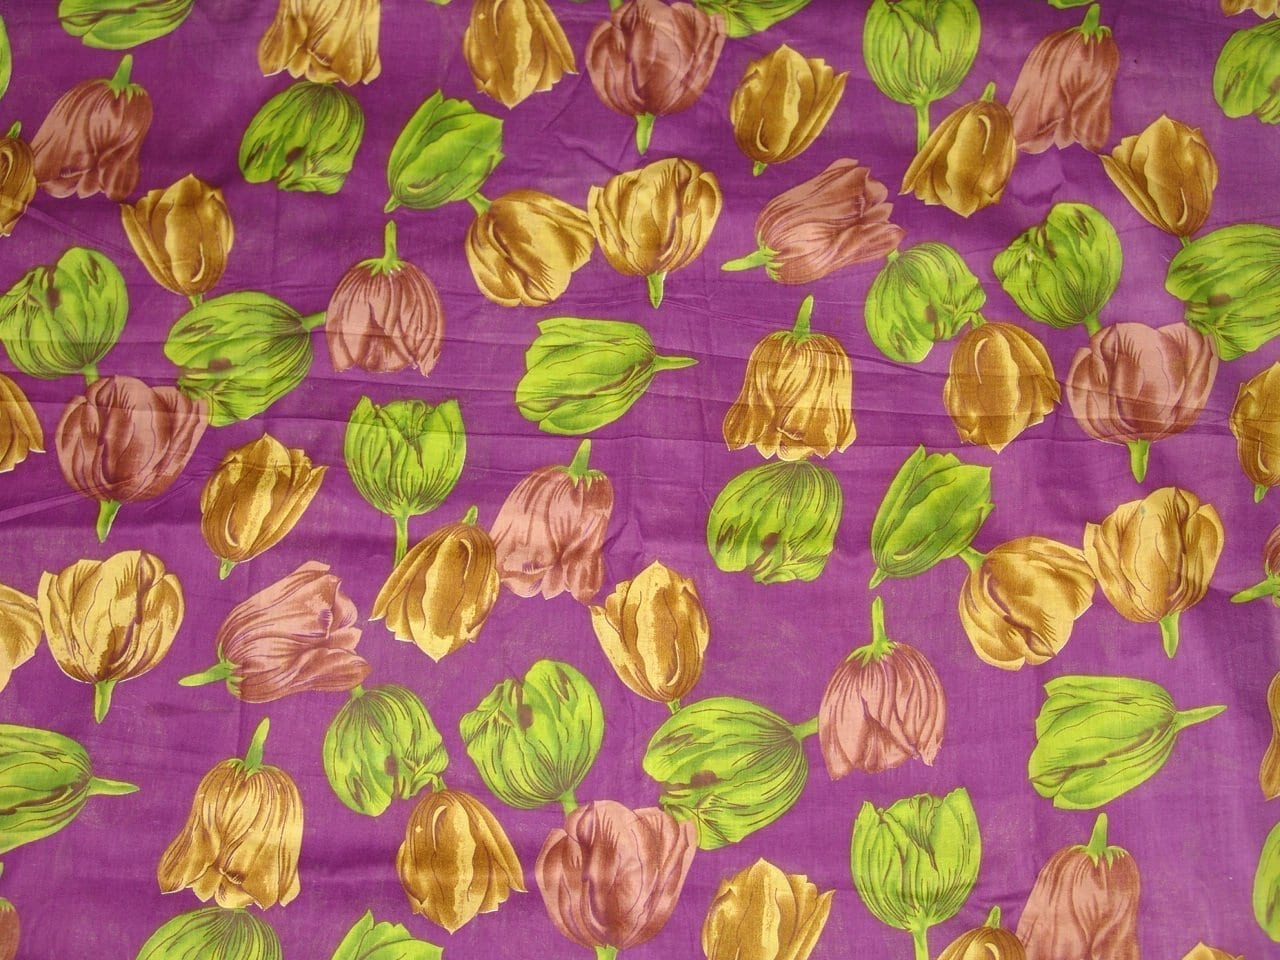 100% Soft PURE COTTON PRINTED fabric (per meter price)  PC082 2